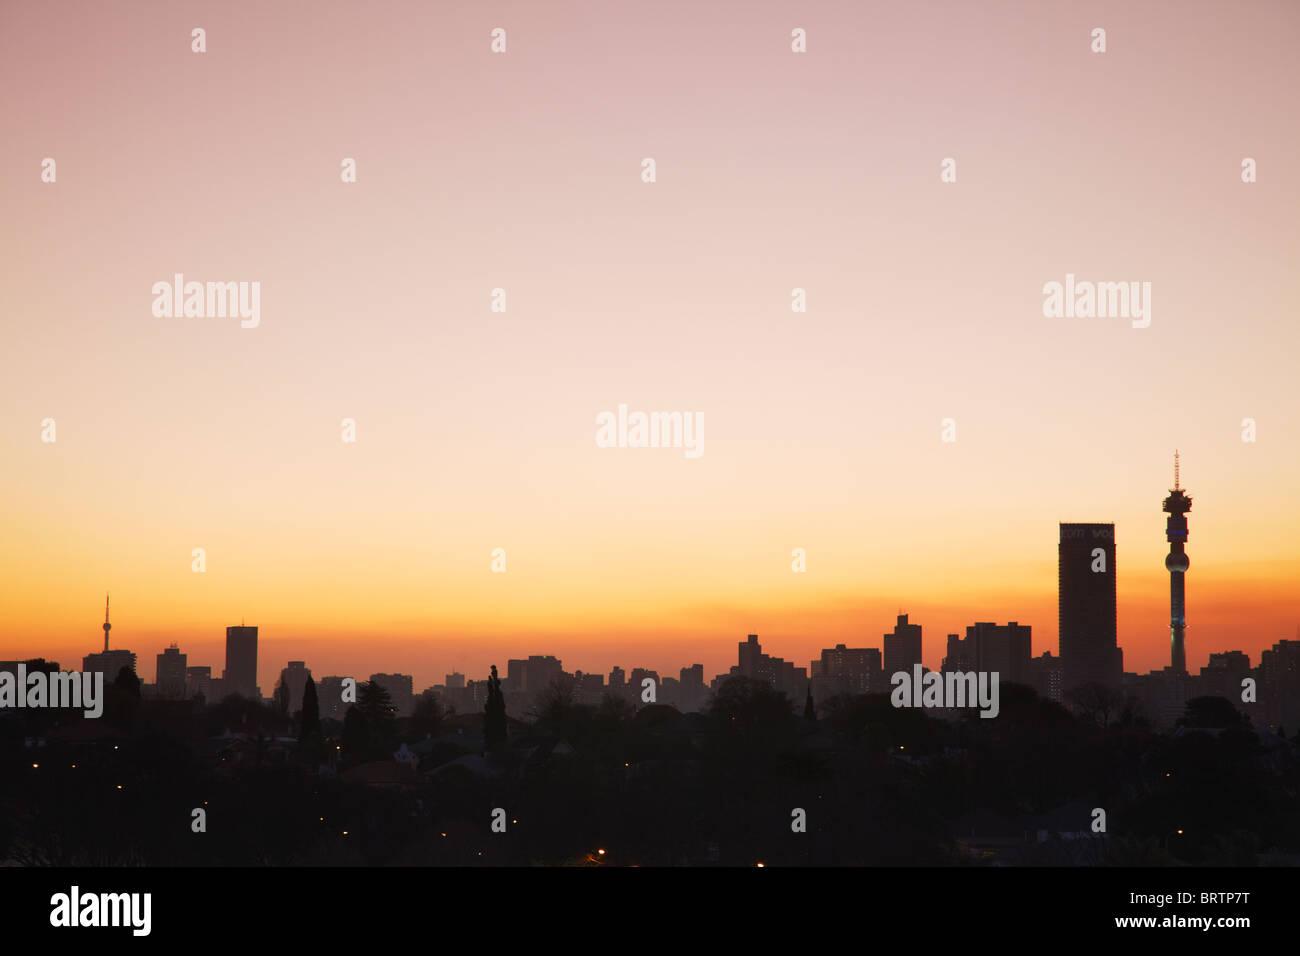 Johannesburg skyline at dusk gauteng south africa stock photo johannesburg skyline at dusk gauteng south africa thecheapjerseys Images